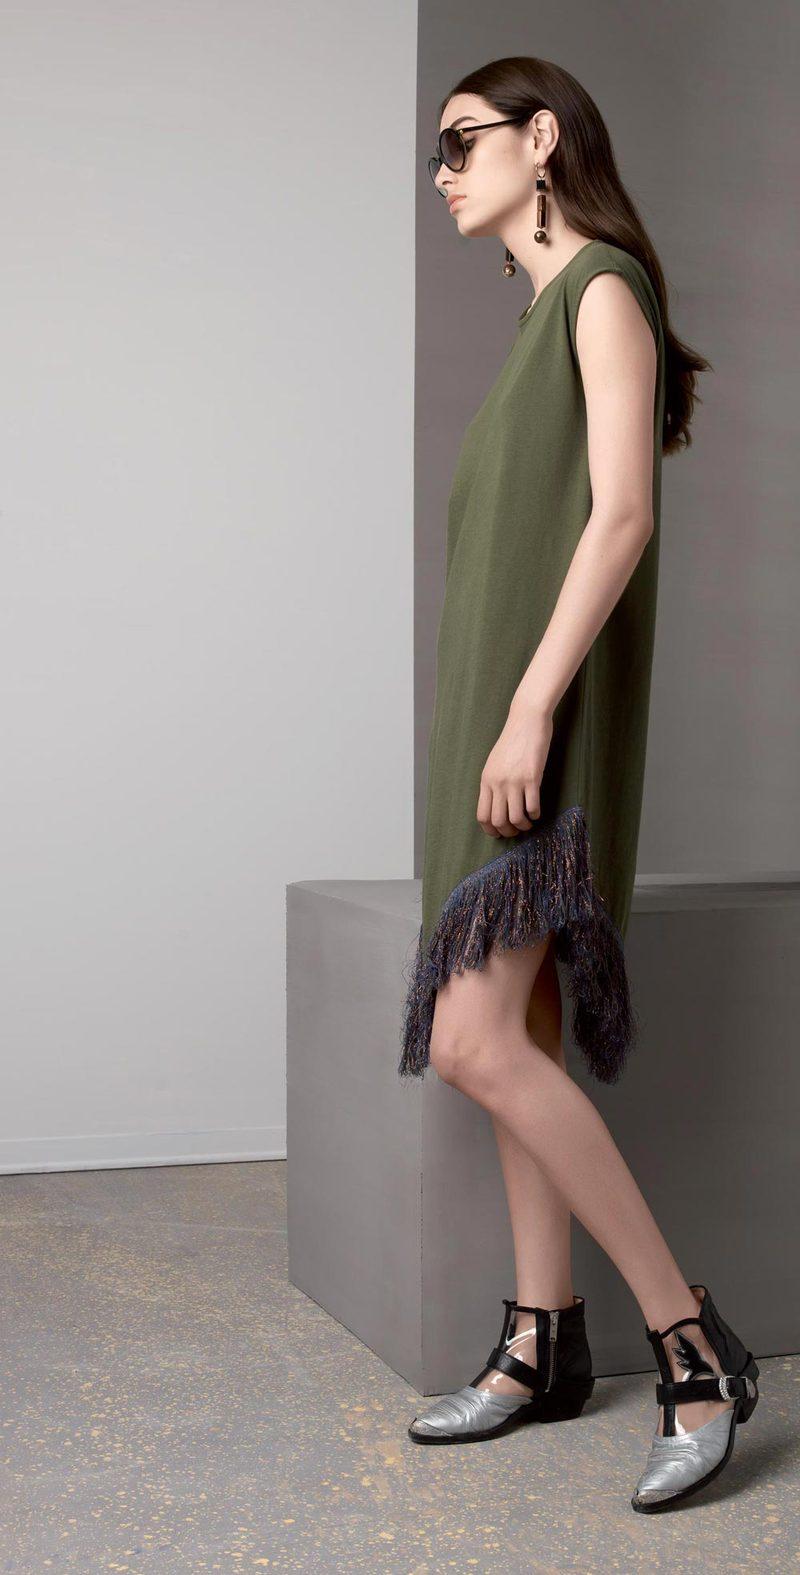 Olive dress with fringe